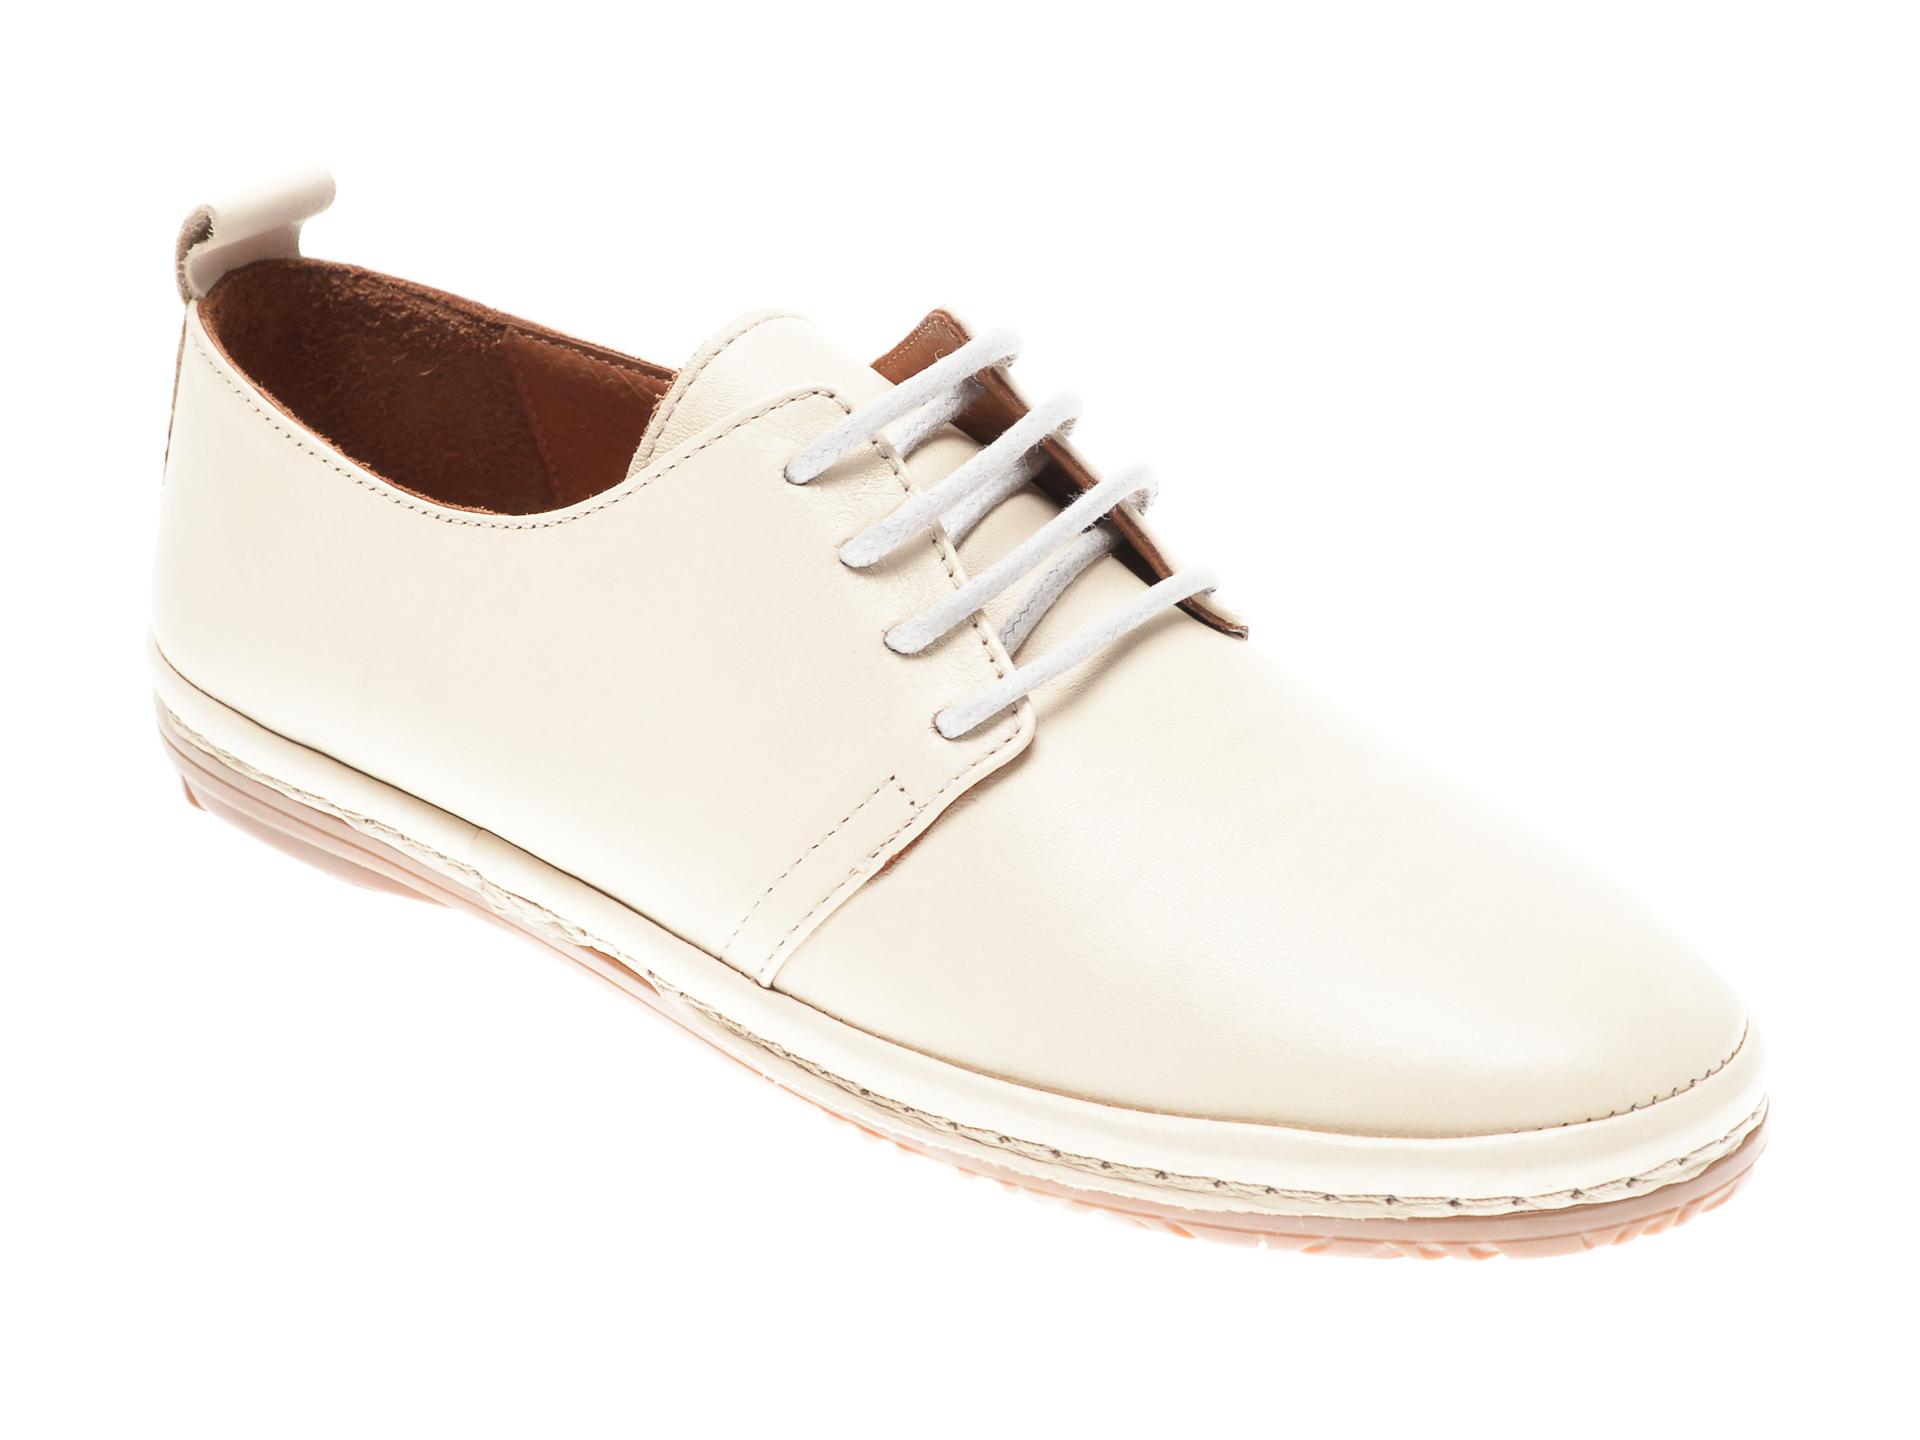 Pantofi Flavia Passini Bej, 951110, Din Piele Naturala